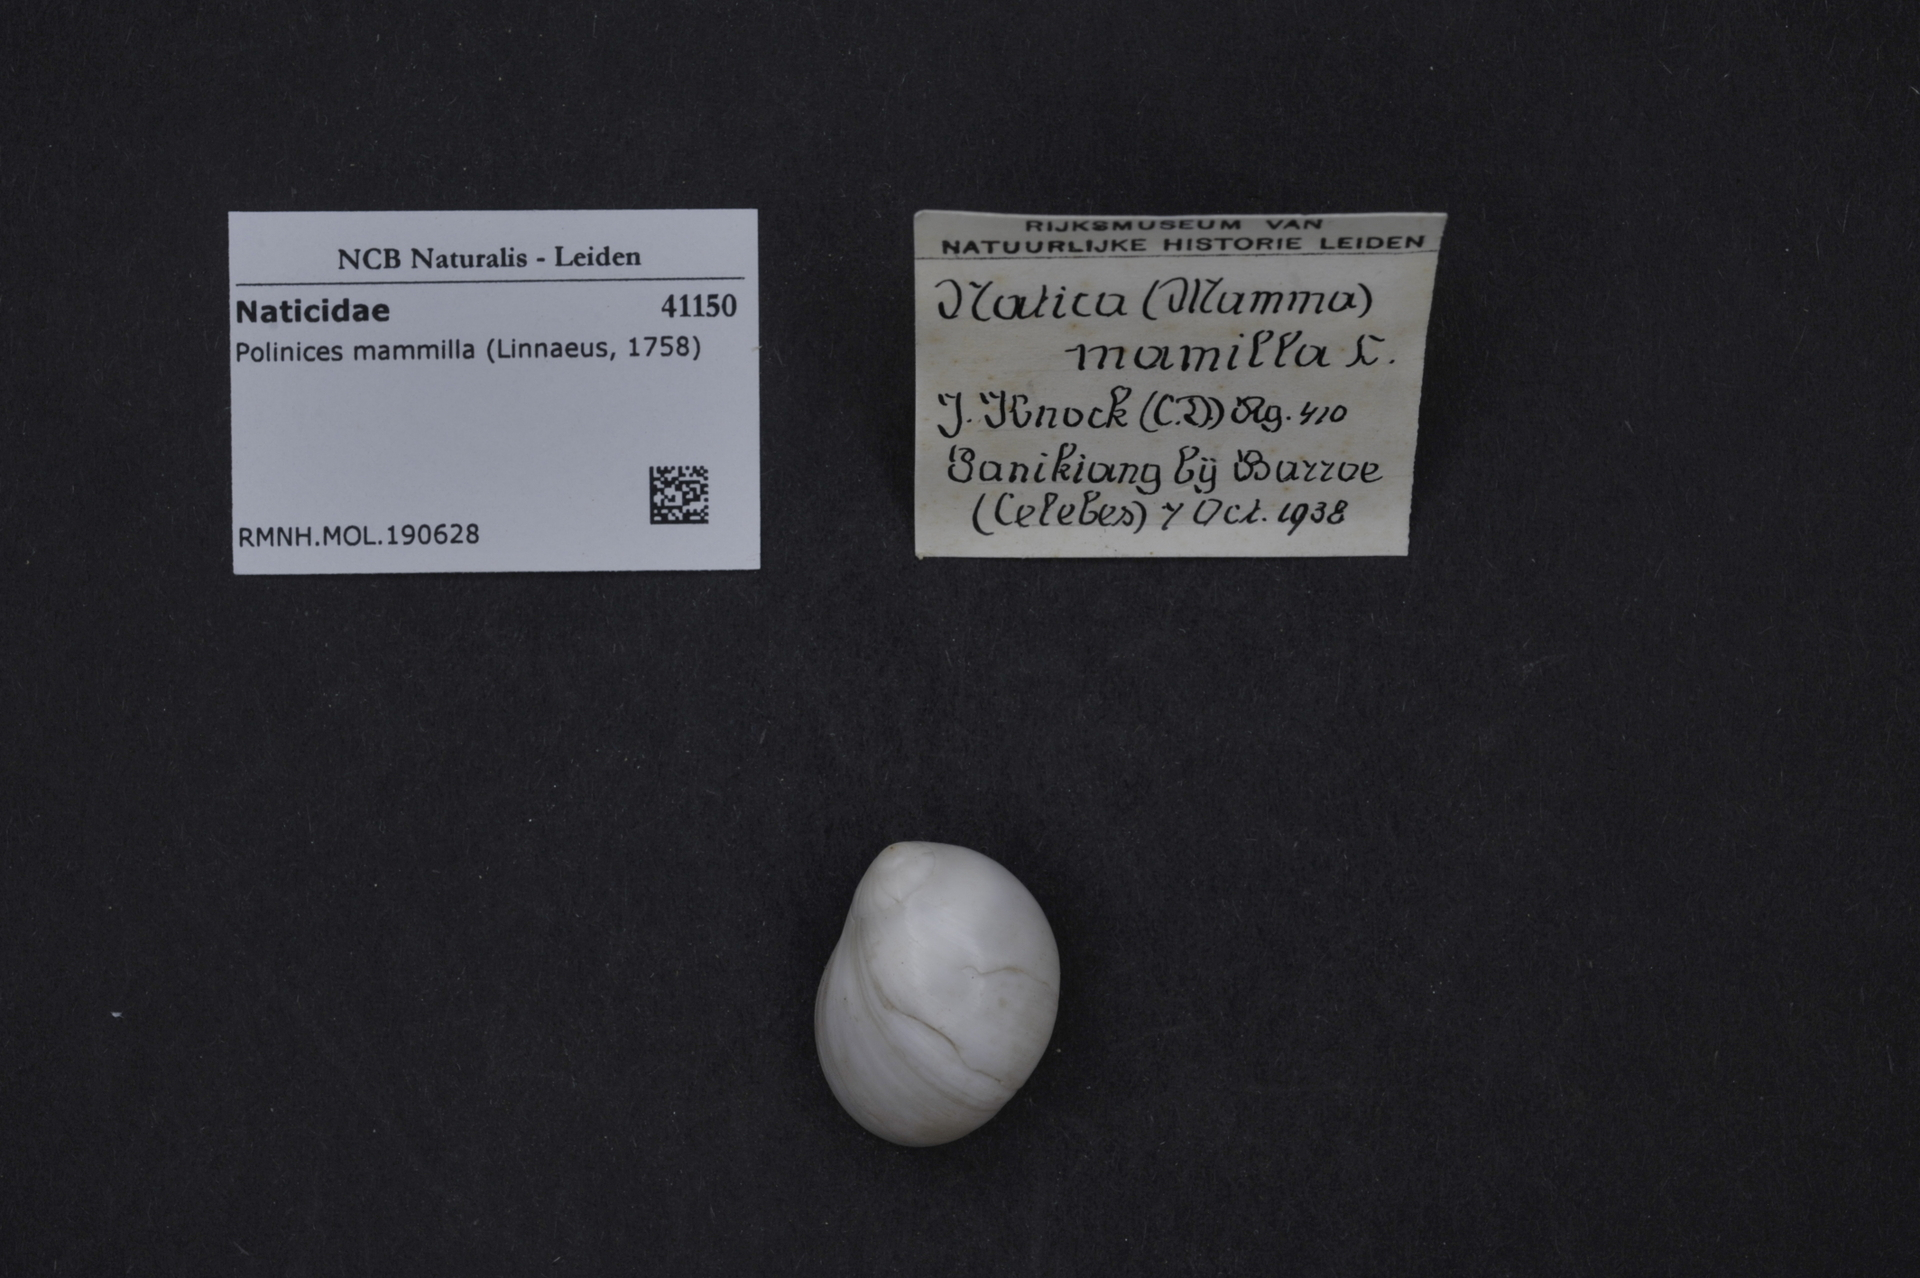 RMNH.MOL.190628 | Polinices mammilla (Linnaeus, 1758)